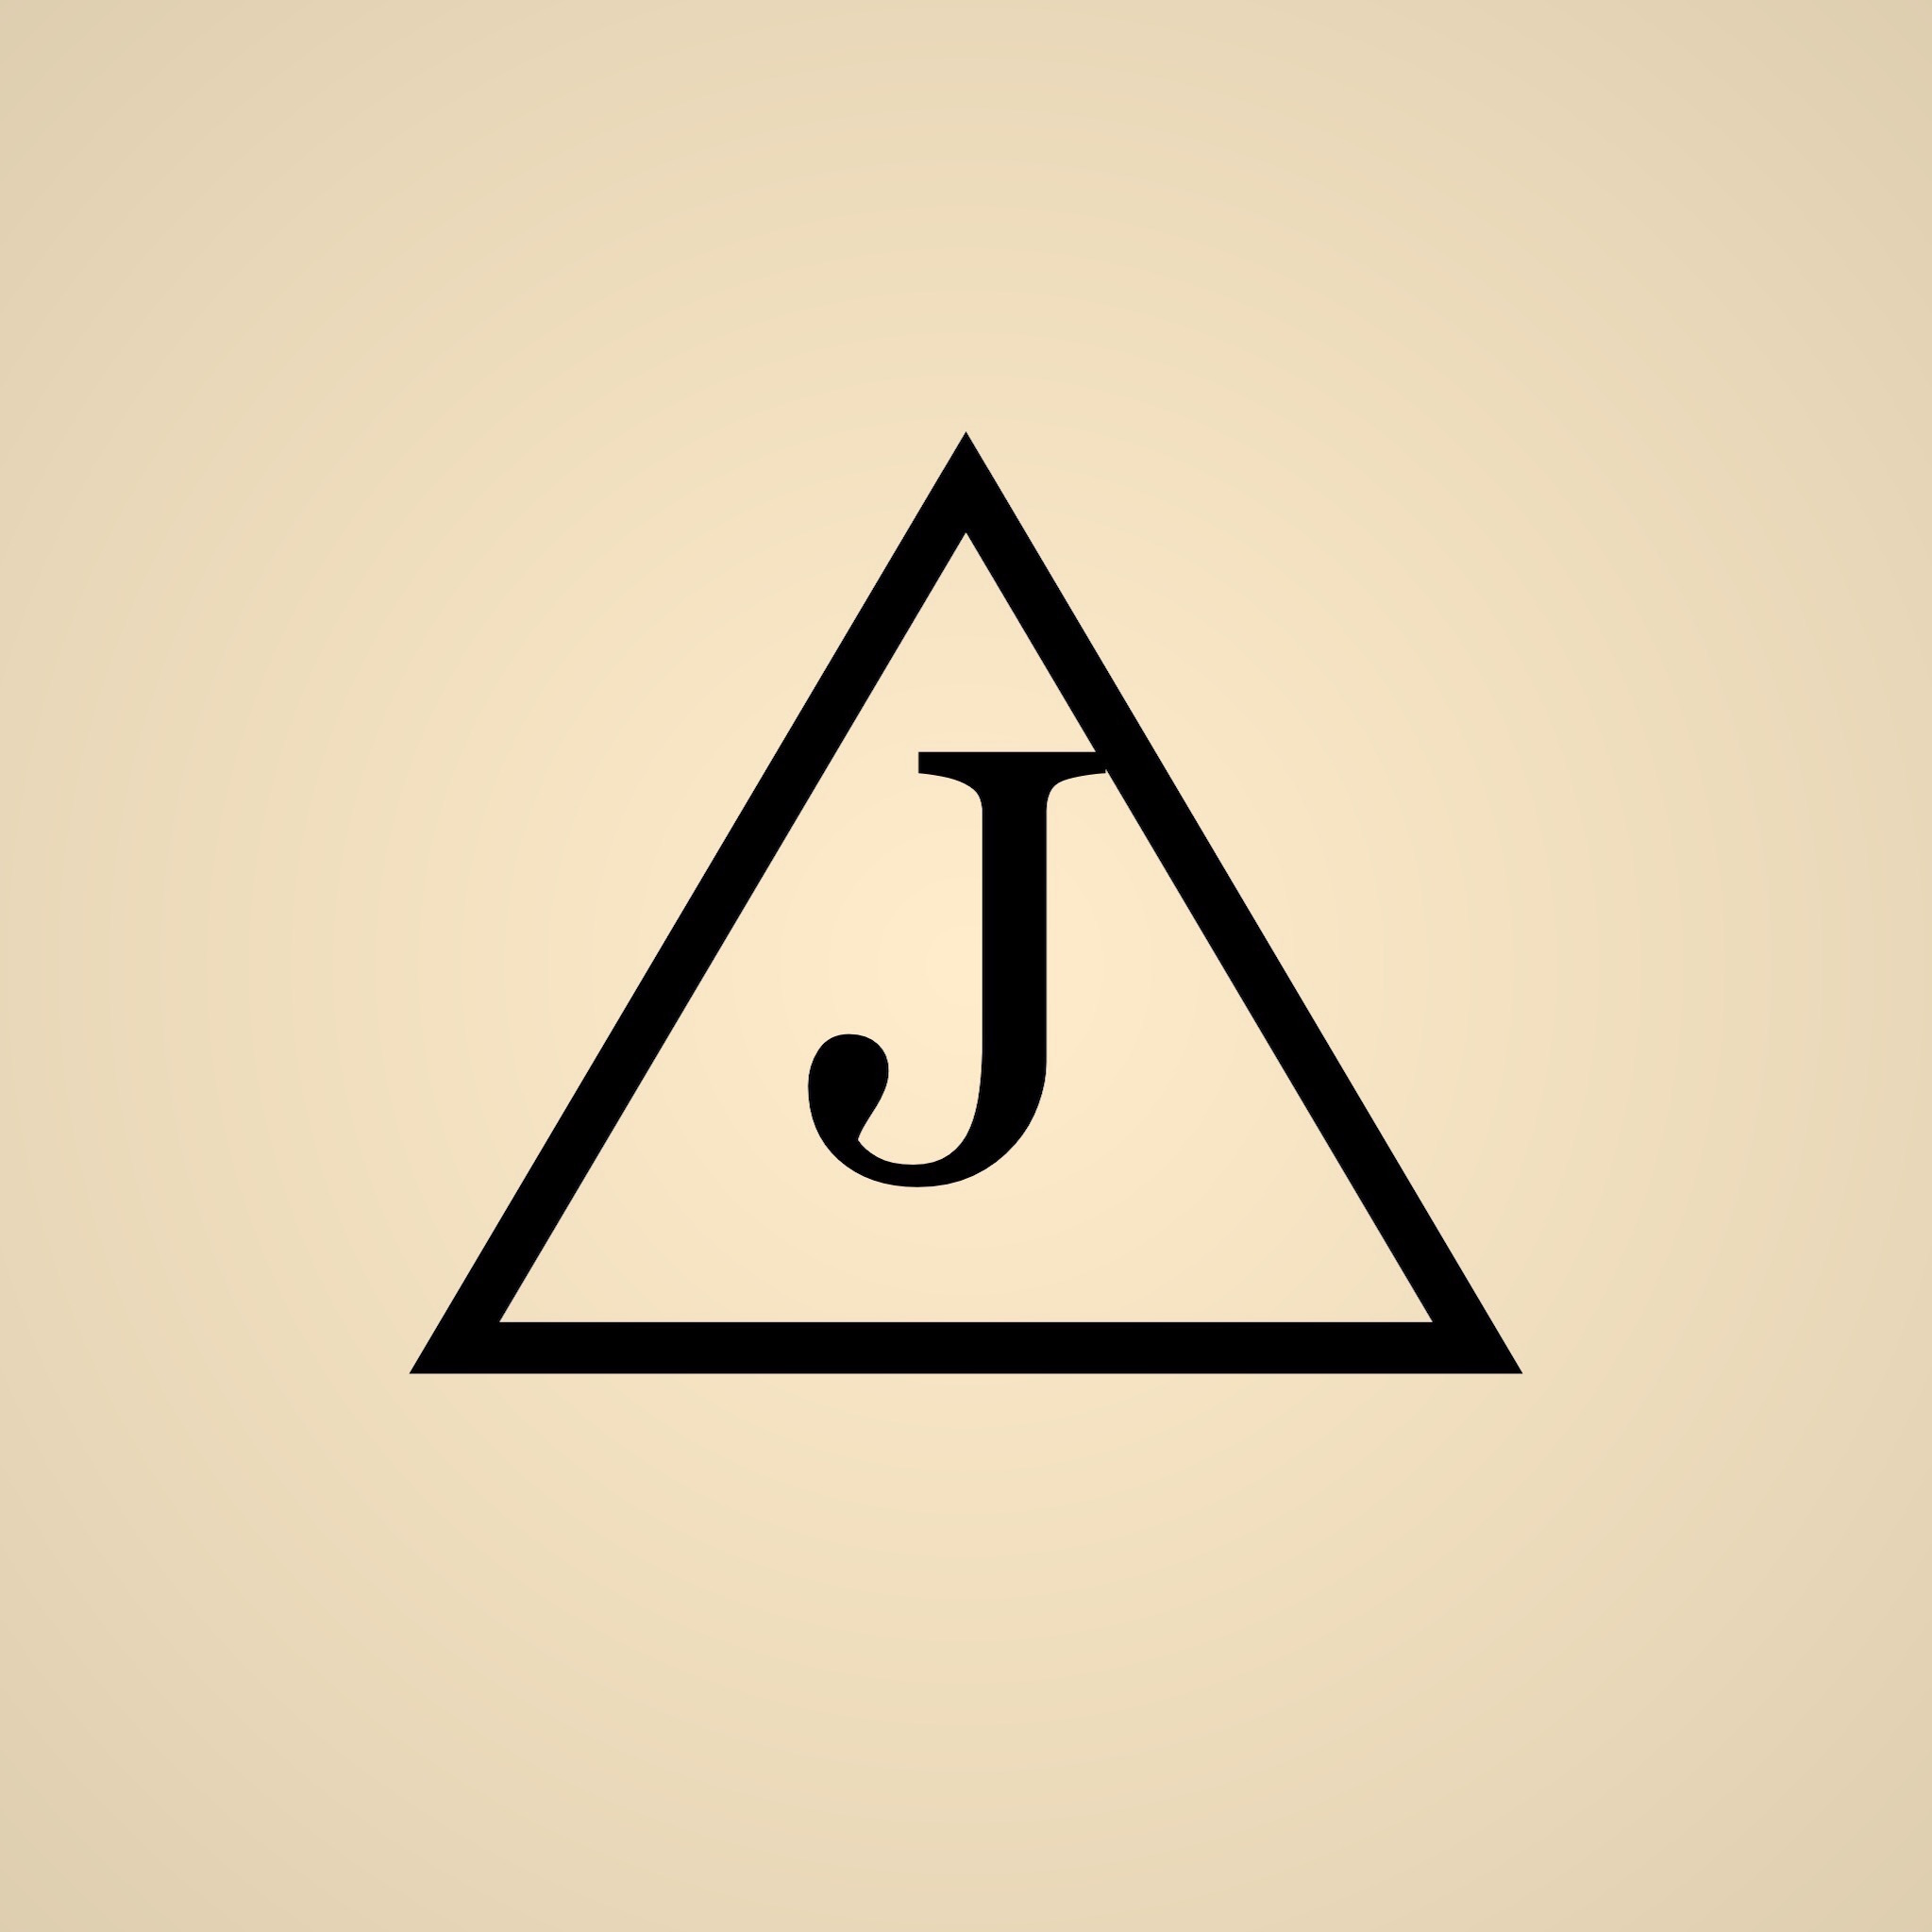 just_in_case_logo